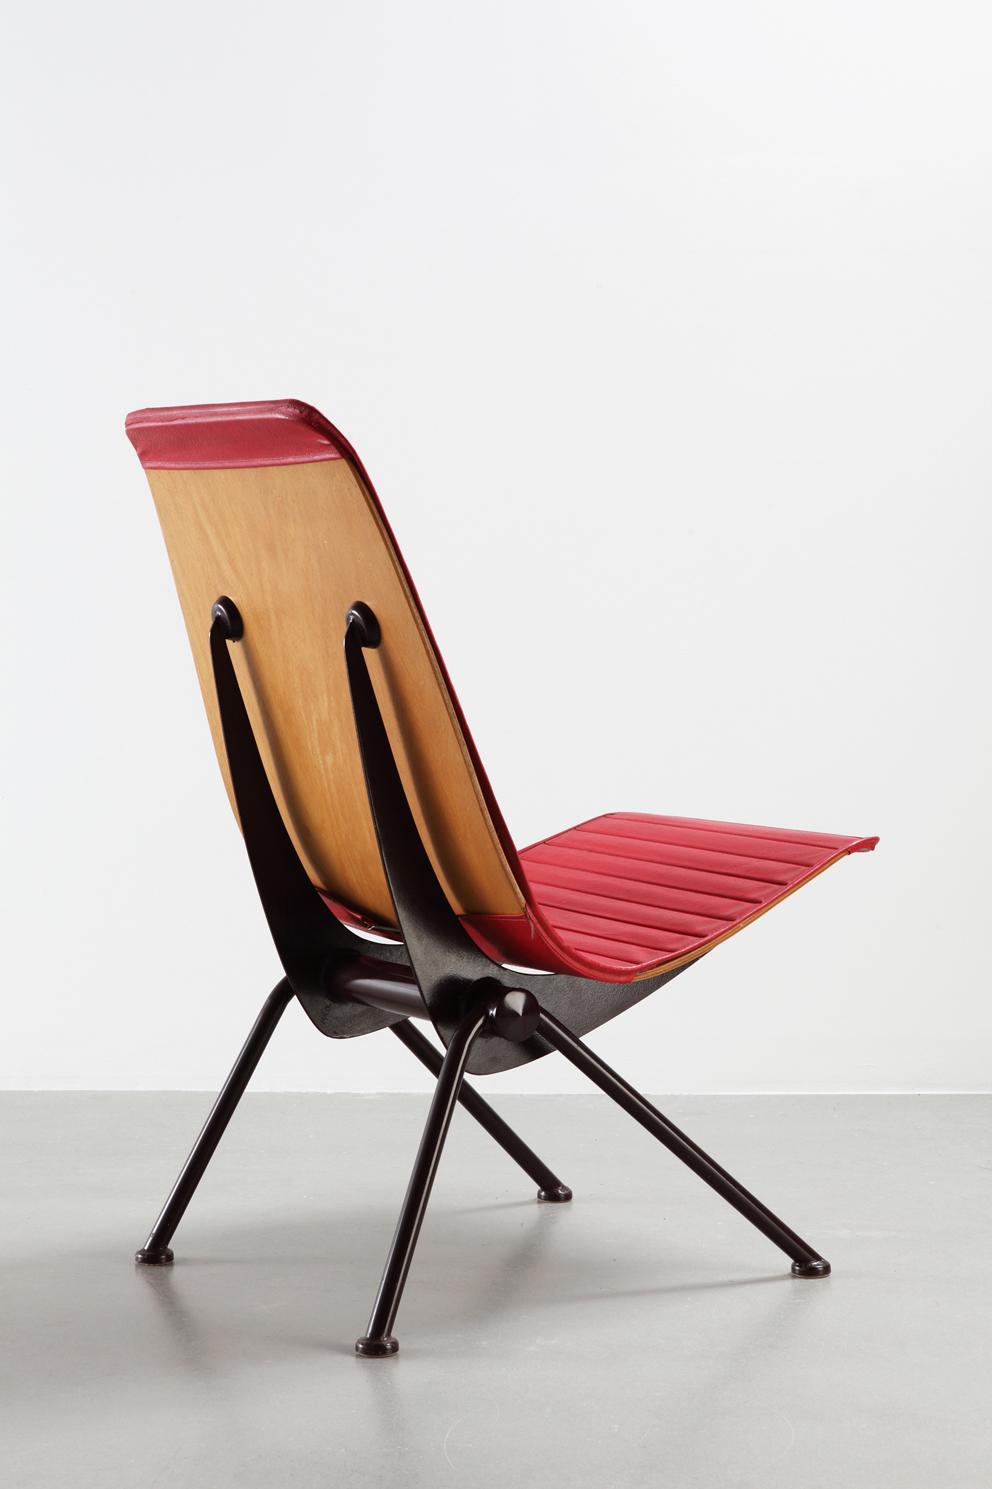 Jean Prouvé, Fauteuil Léger n°356, dit «chaise Antony» variante con ussa in similpelle, 1955.